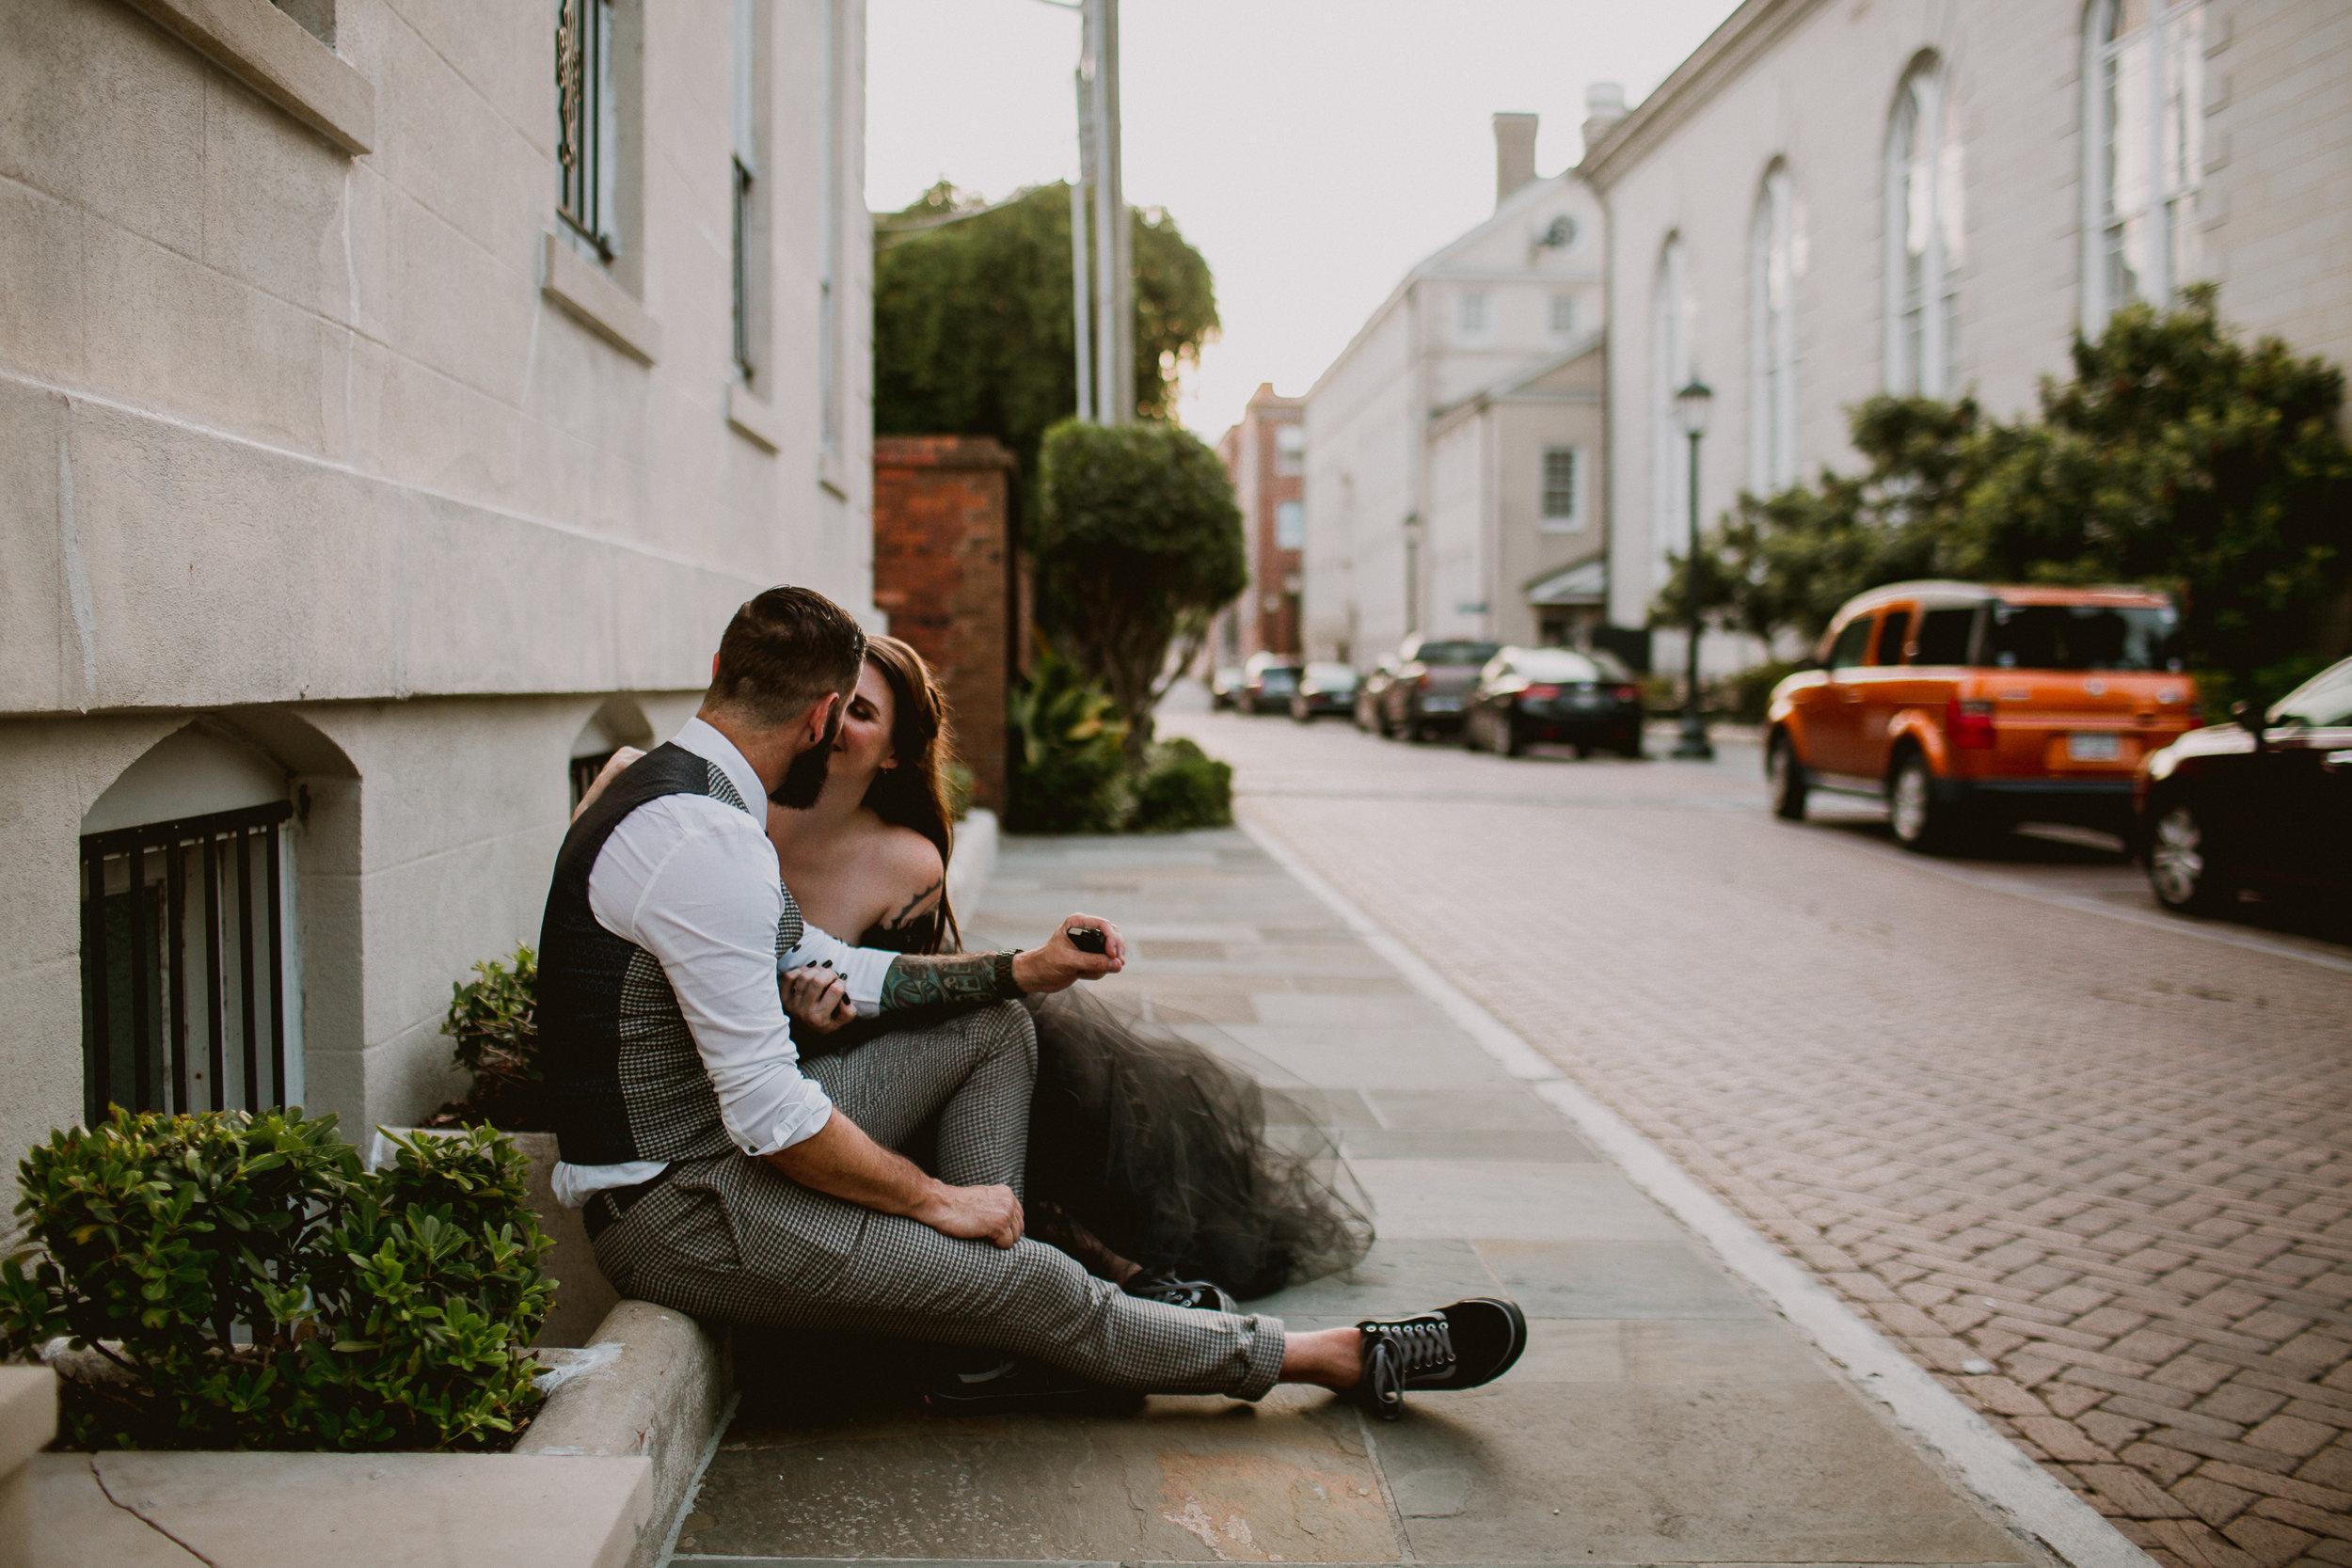 bohemian-hotel-savannah-elopement-kelley-raye-atlanta-wedding-photographer-154.jpg